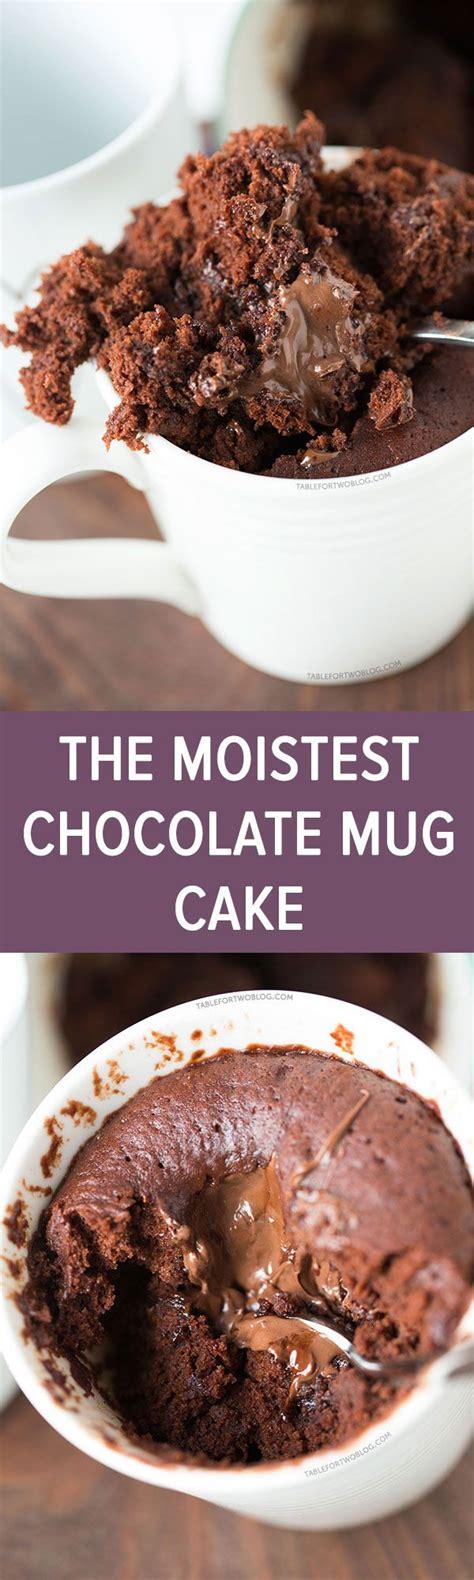 mug recipies 1000 ideas about microwave mug brownies on pinterest mug brownie recipes microwave mug cakes